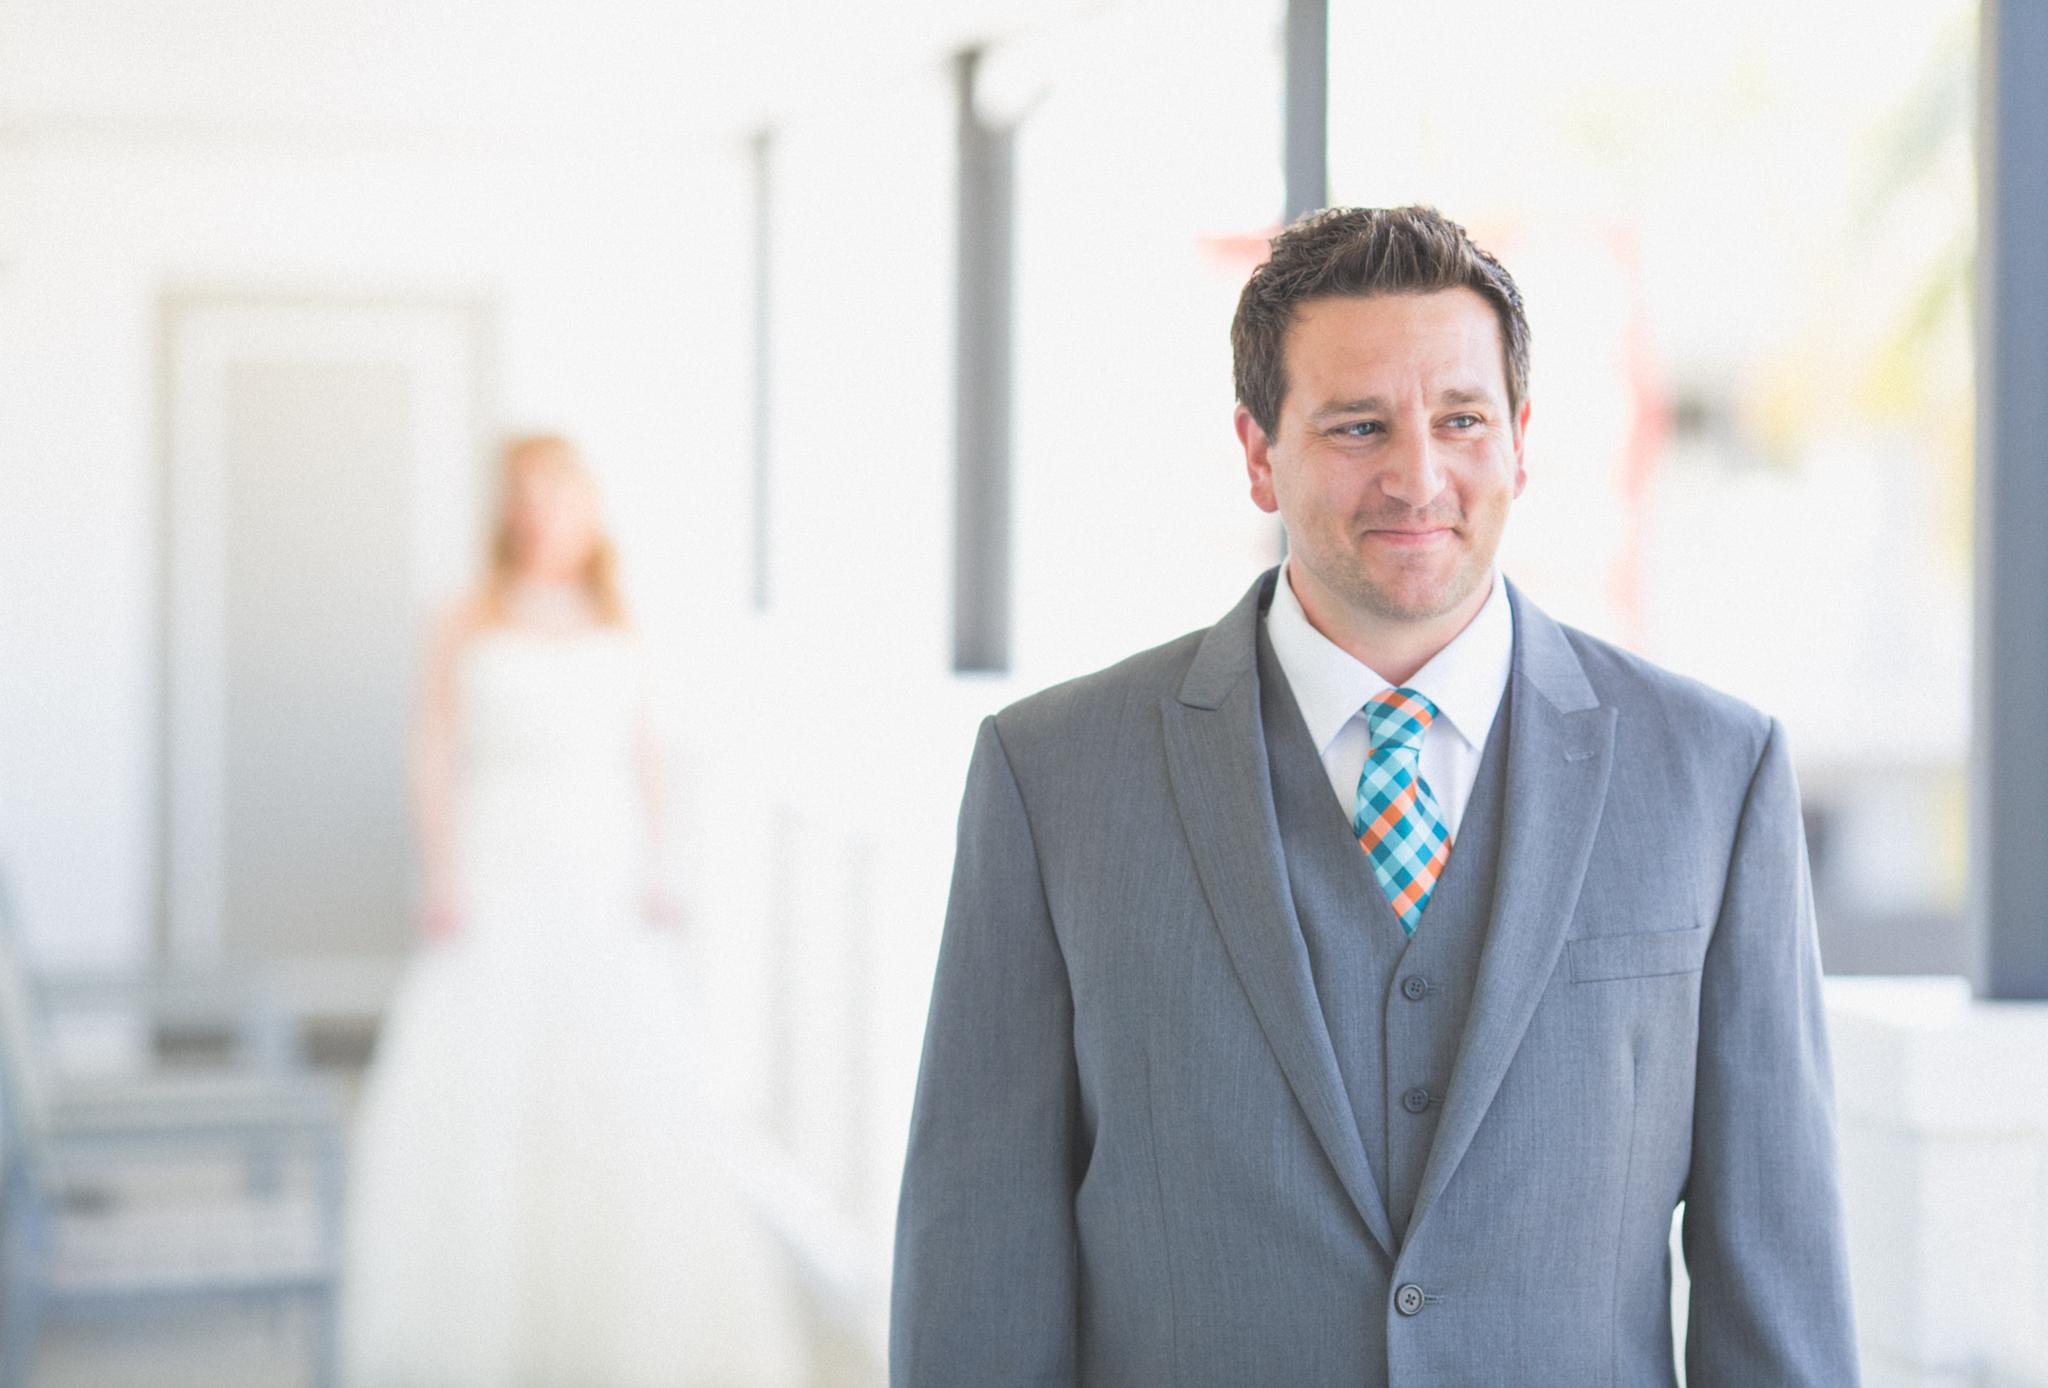 scottsdale-wedding-photographer-el-dorado-ben-first-look